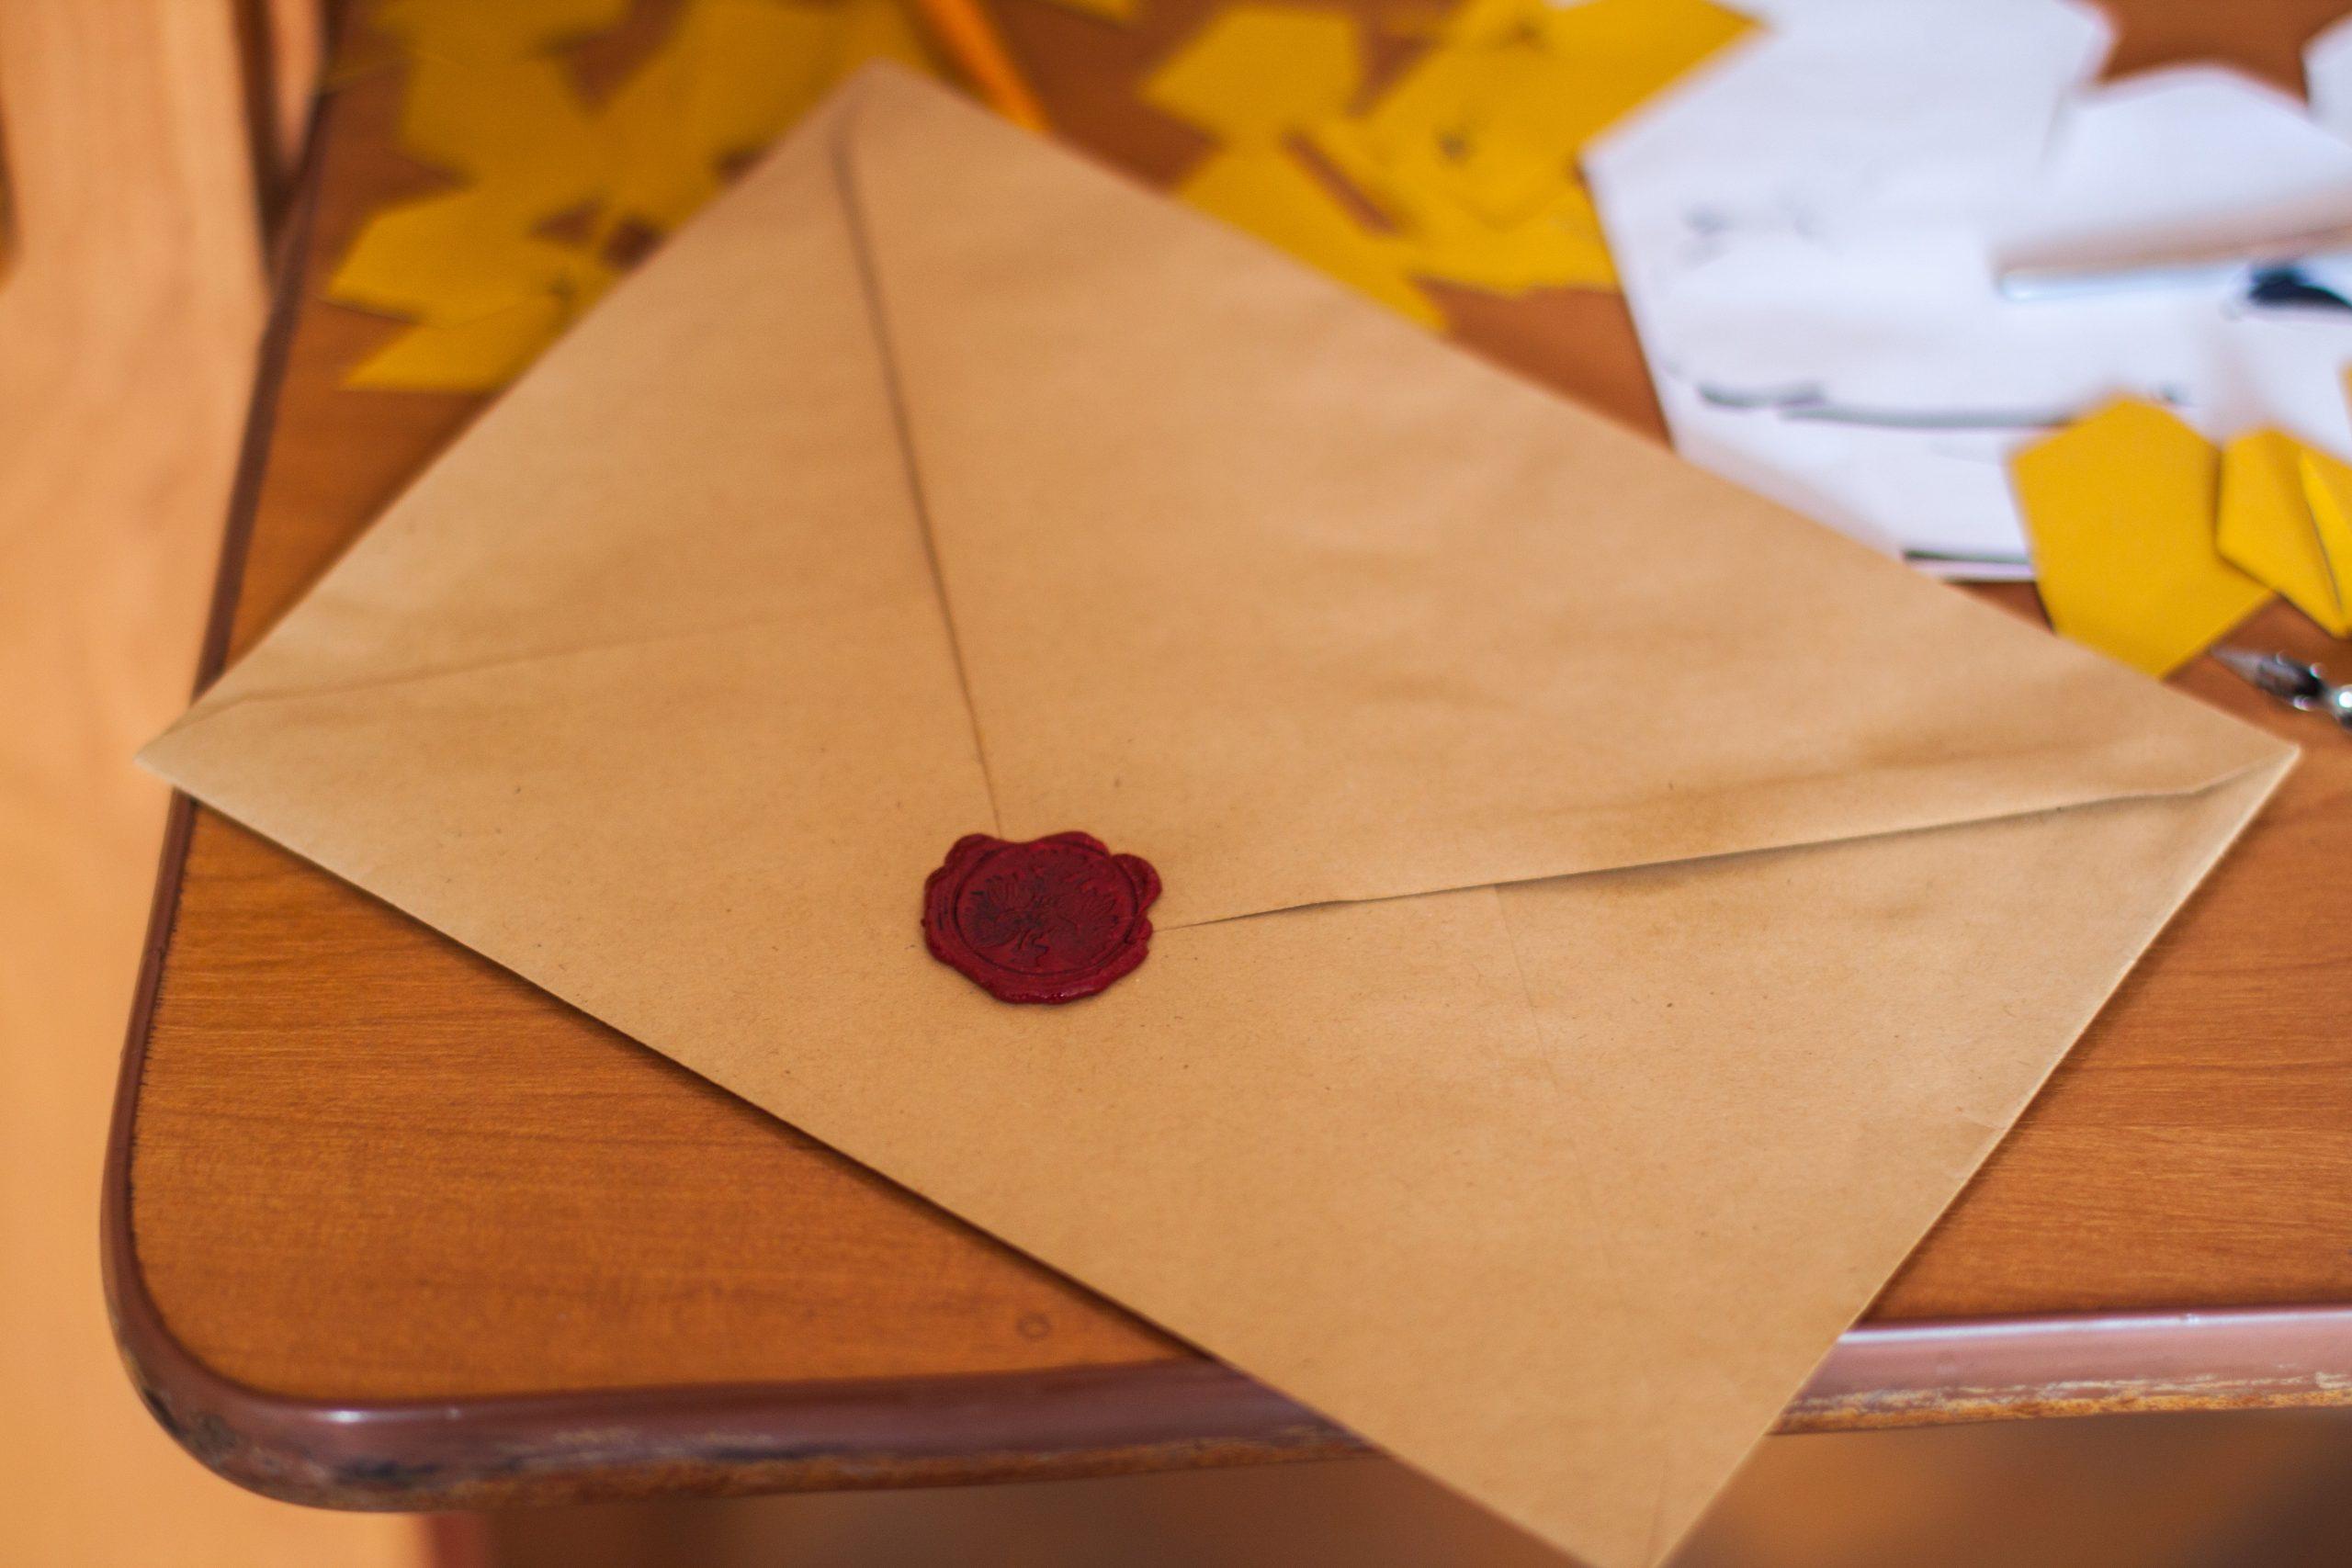 Podcast Episode Twenty-Eight: Listener Mailbag 2